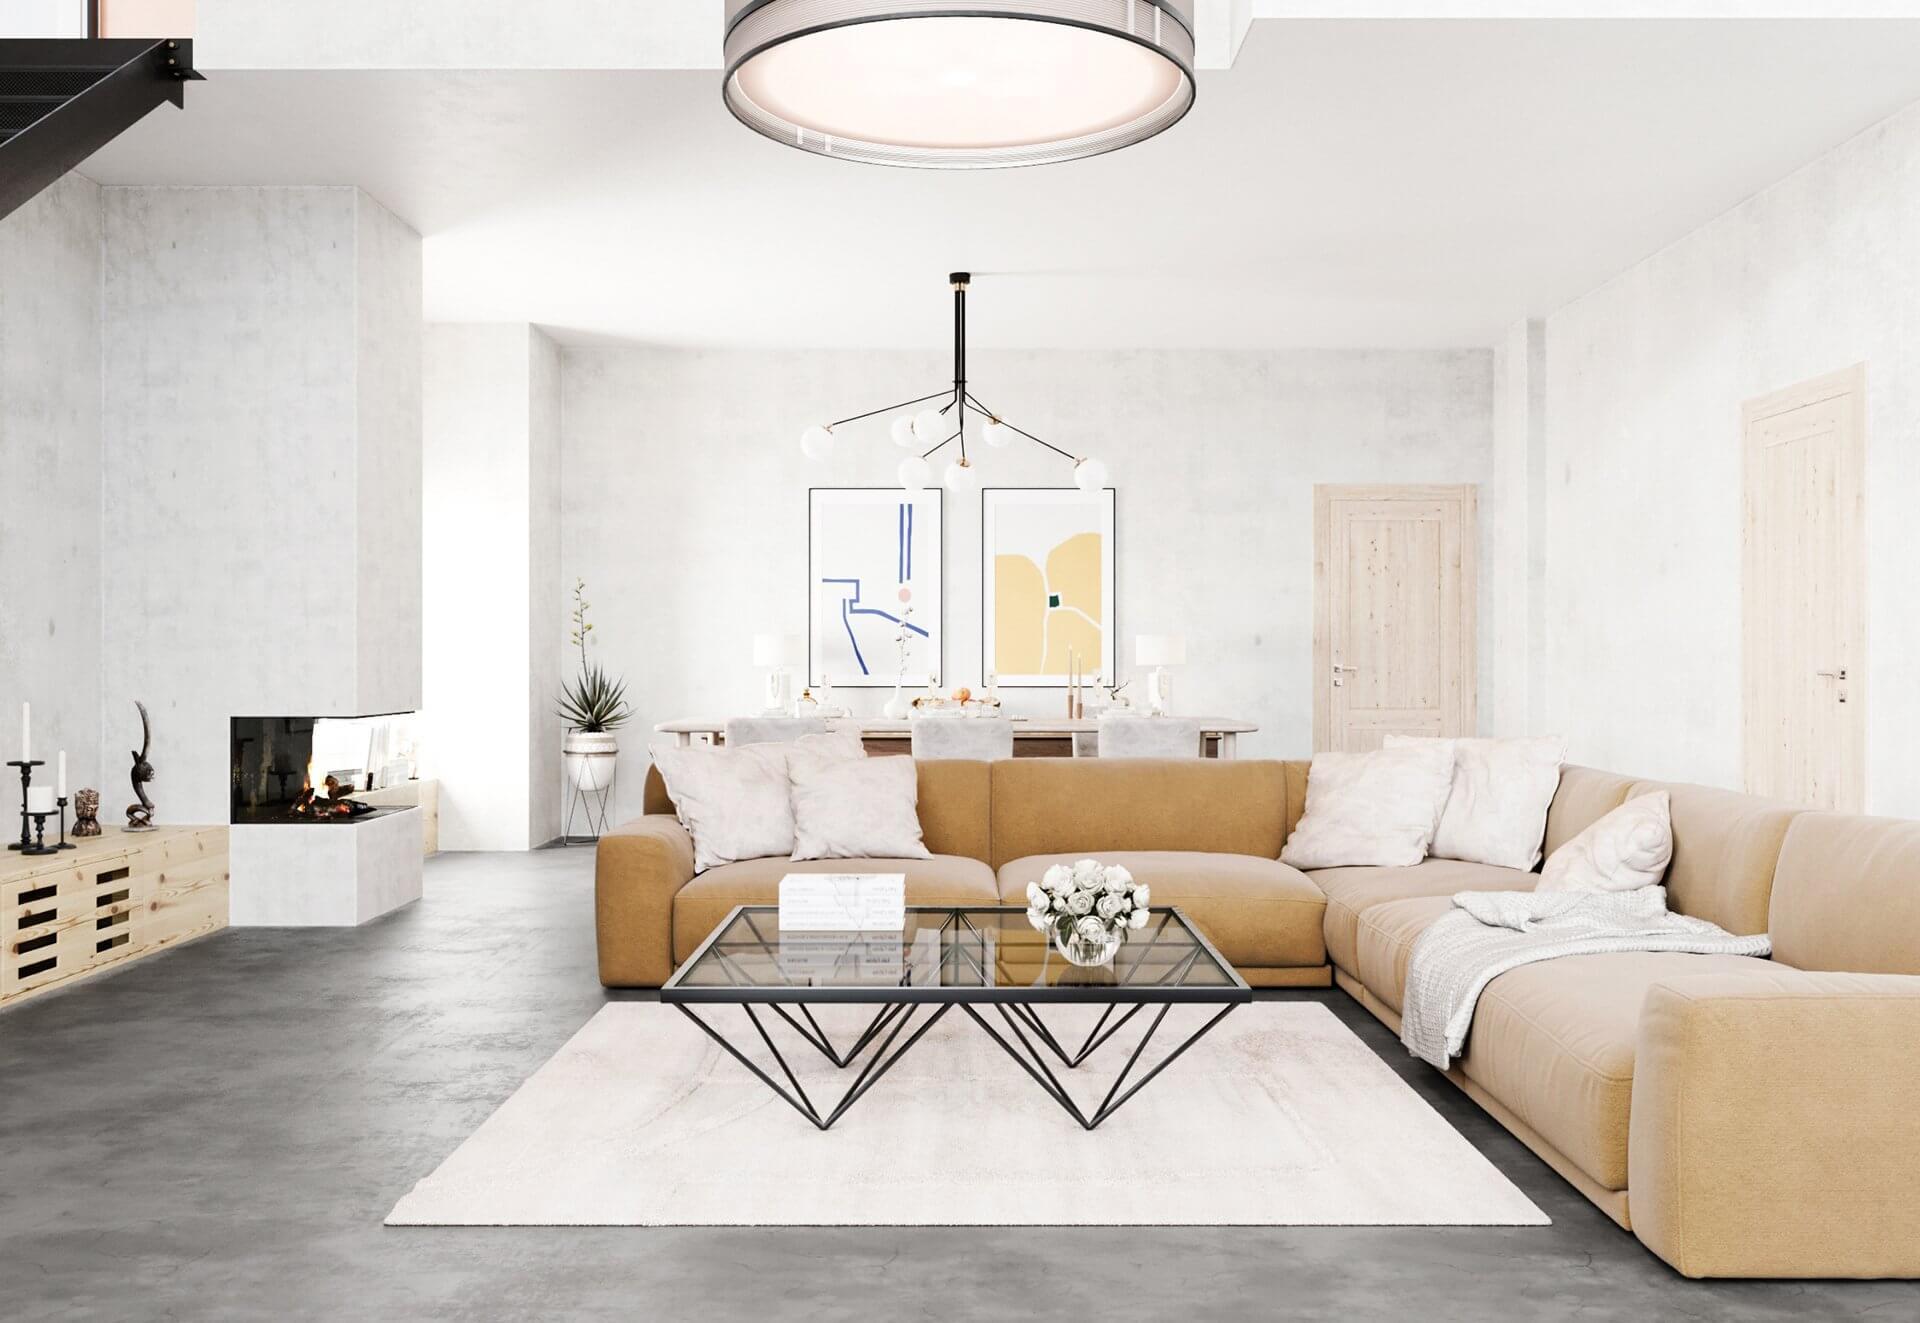 Sin-cinnati living room yellow sofa fire place